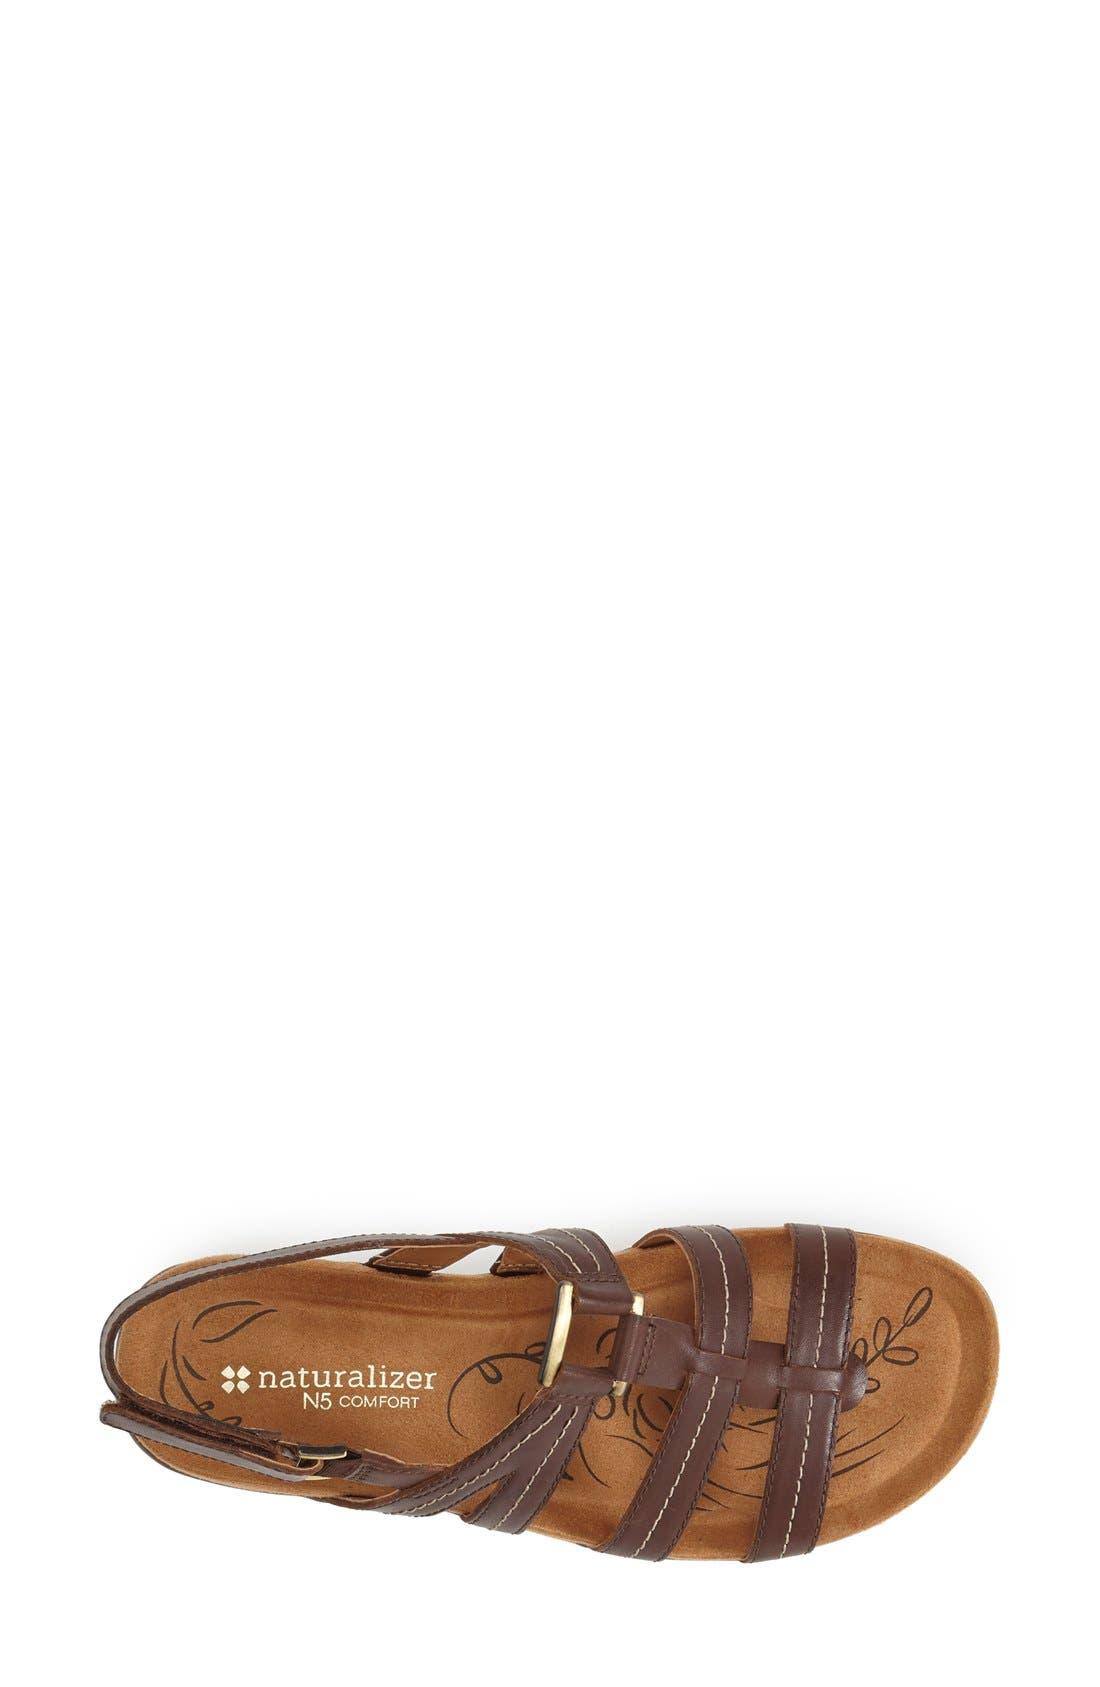 Alternate Image 3  - Naturalizer 'Every' Slingback Sandal (Women)